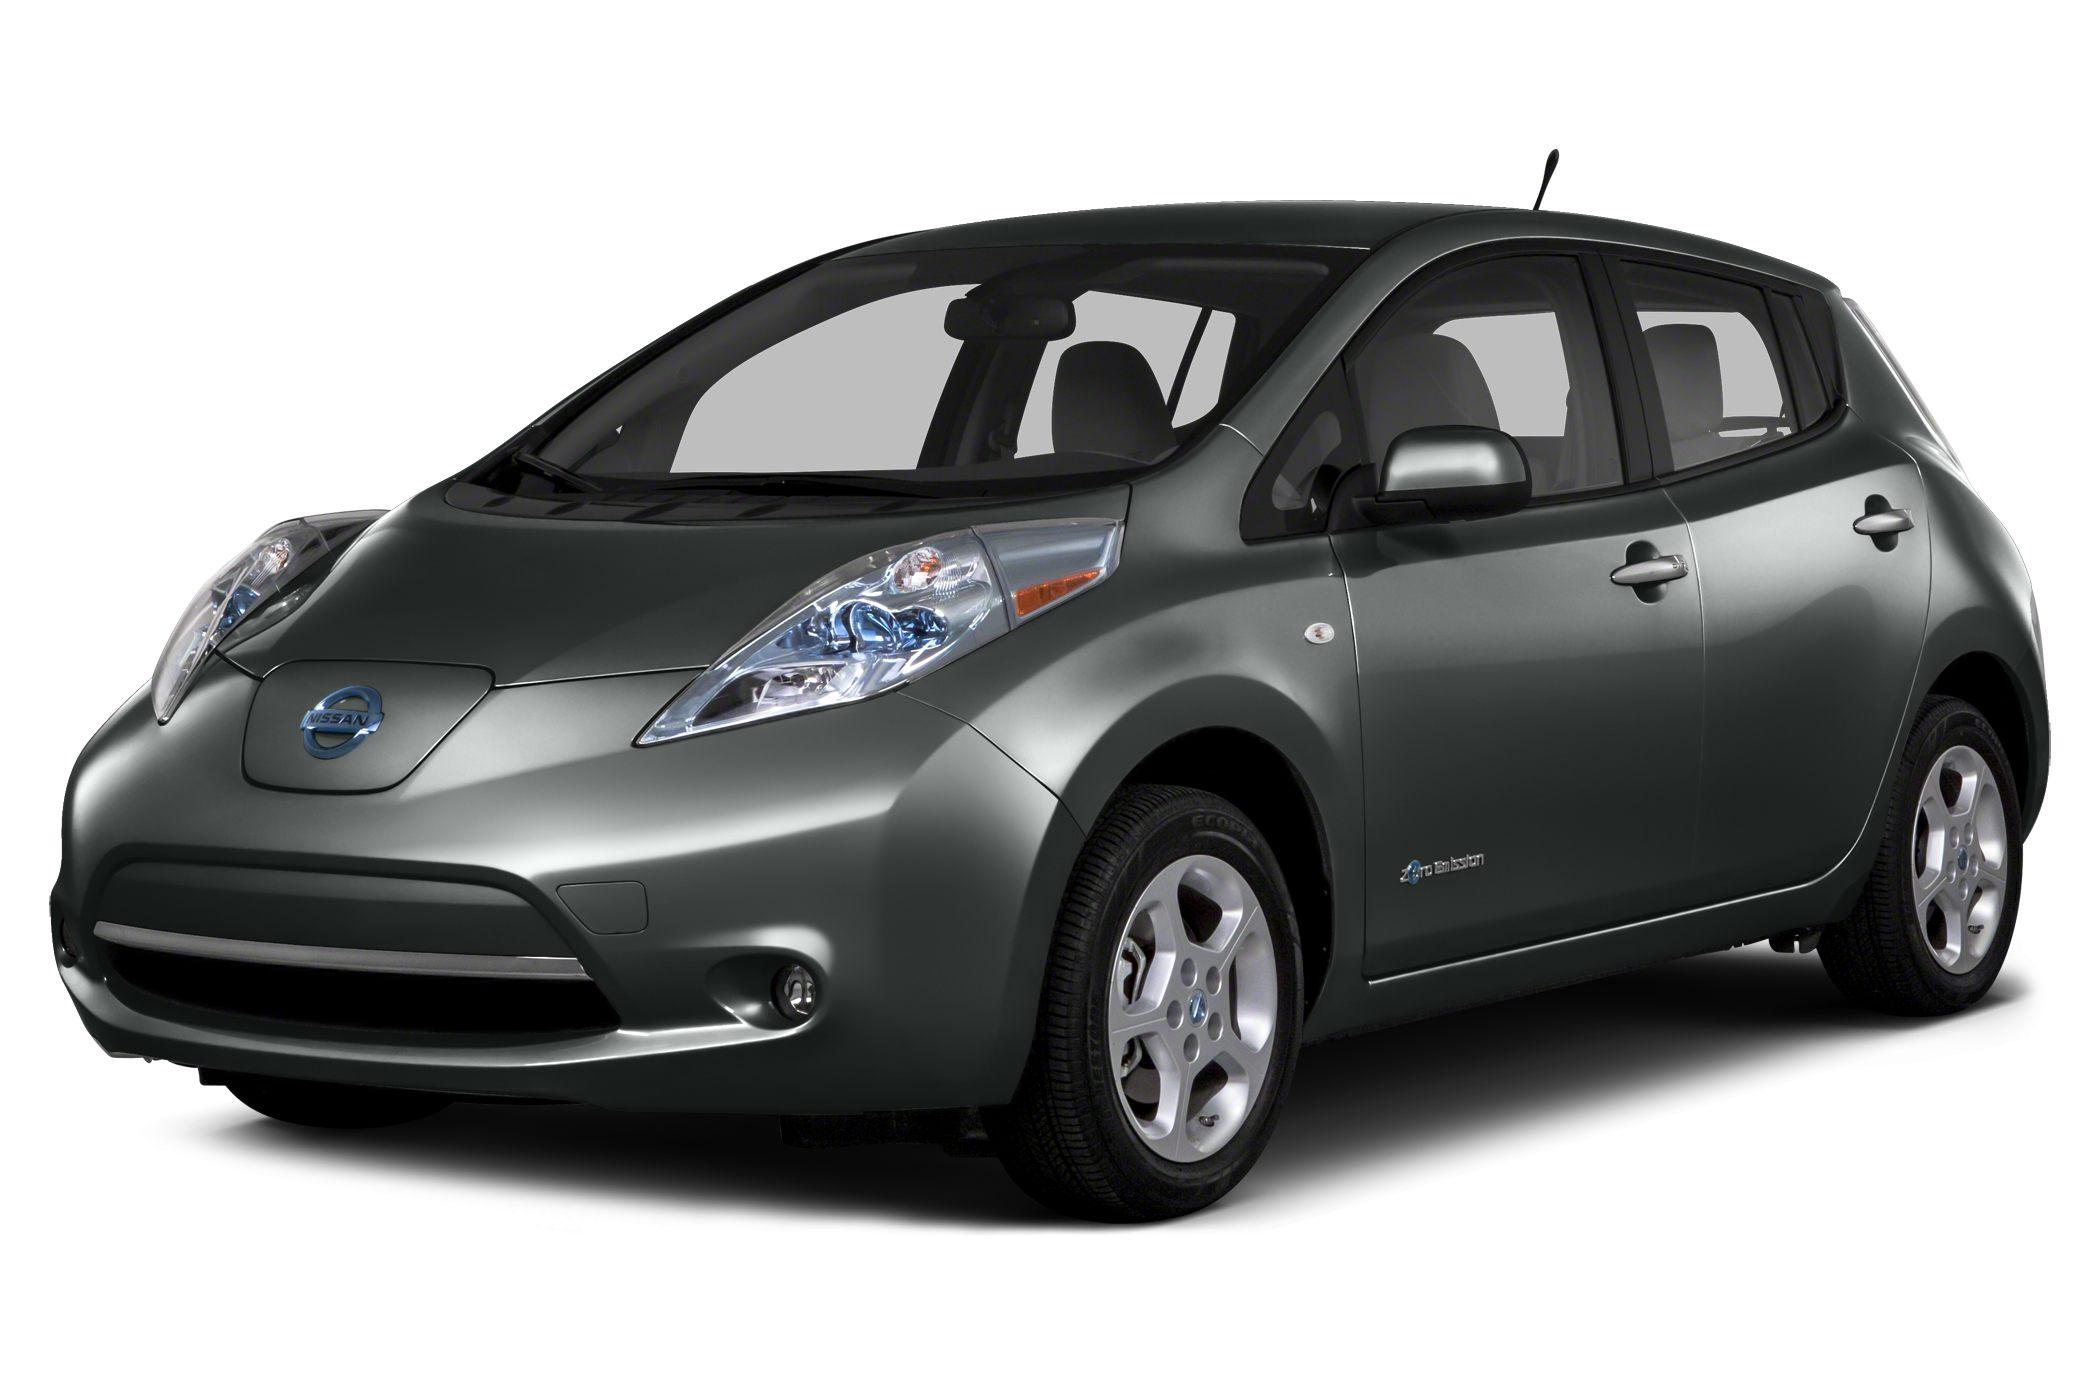 Next nissan motor co ltd adr leaf will increase driving for Nissan motor co ltd